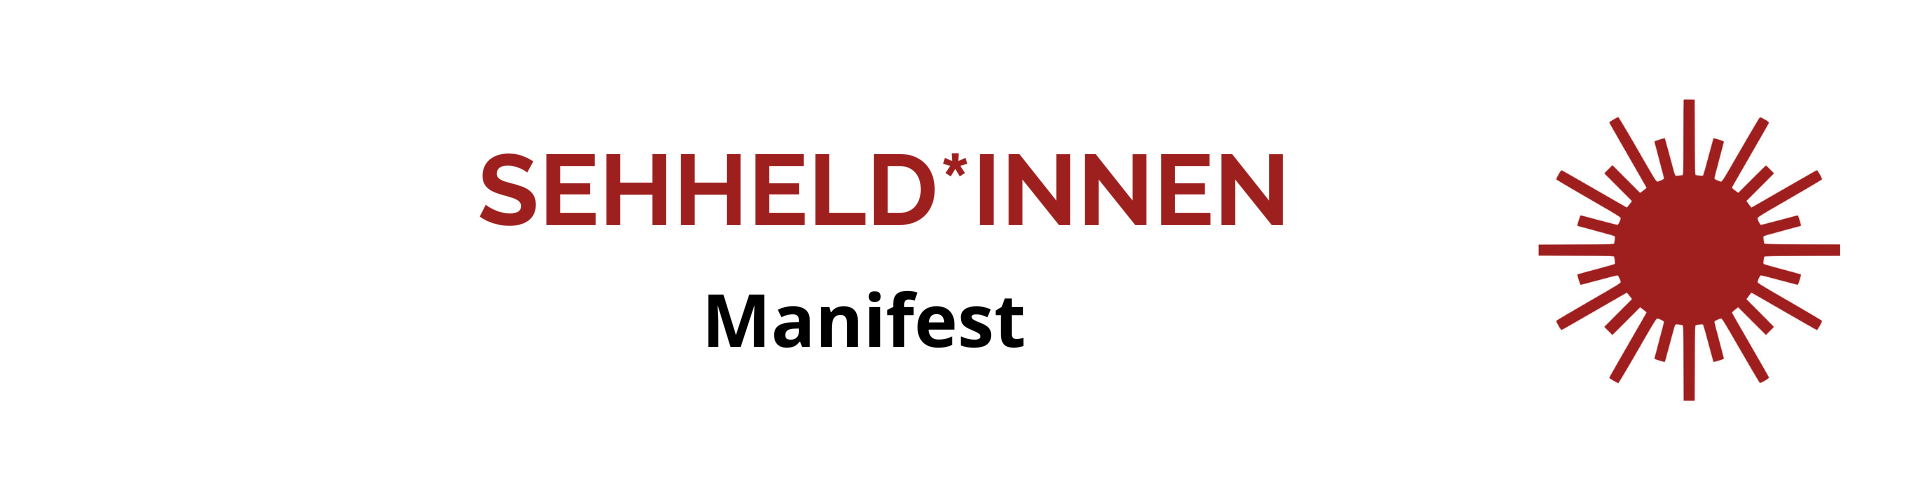 Sehheld*innen-Manifest